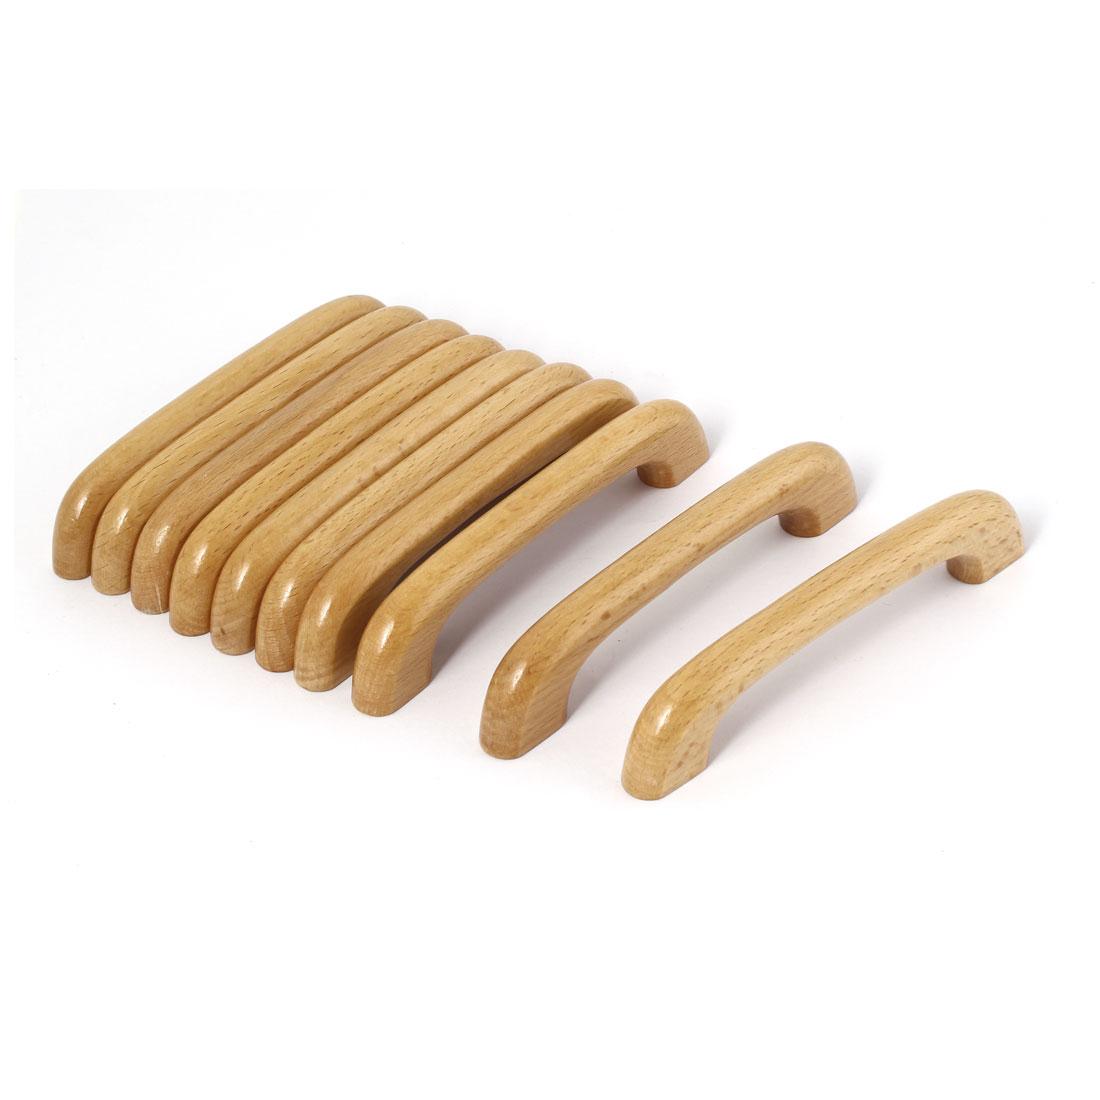 Cupboard Door Drawer Hardware Wood Pull Handles Beige 3.5mm Thread Hole 10 Pcs